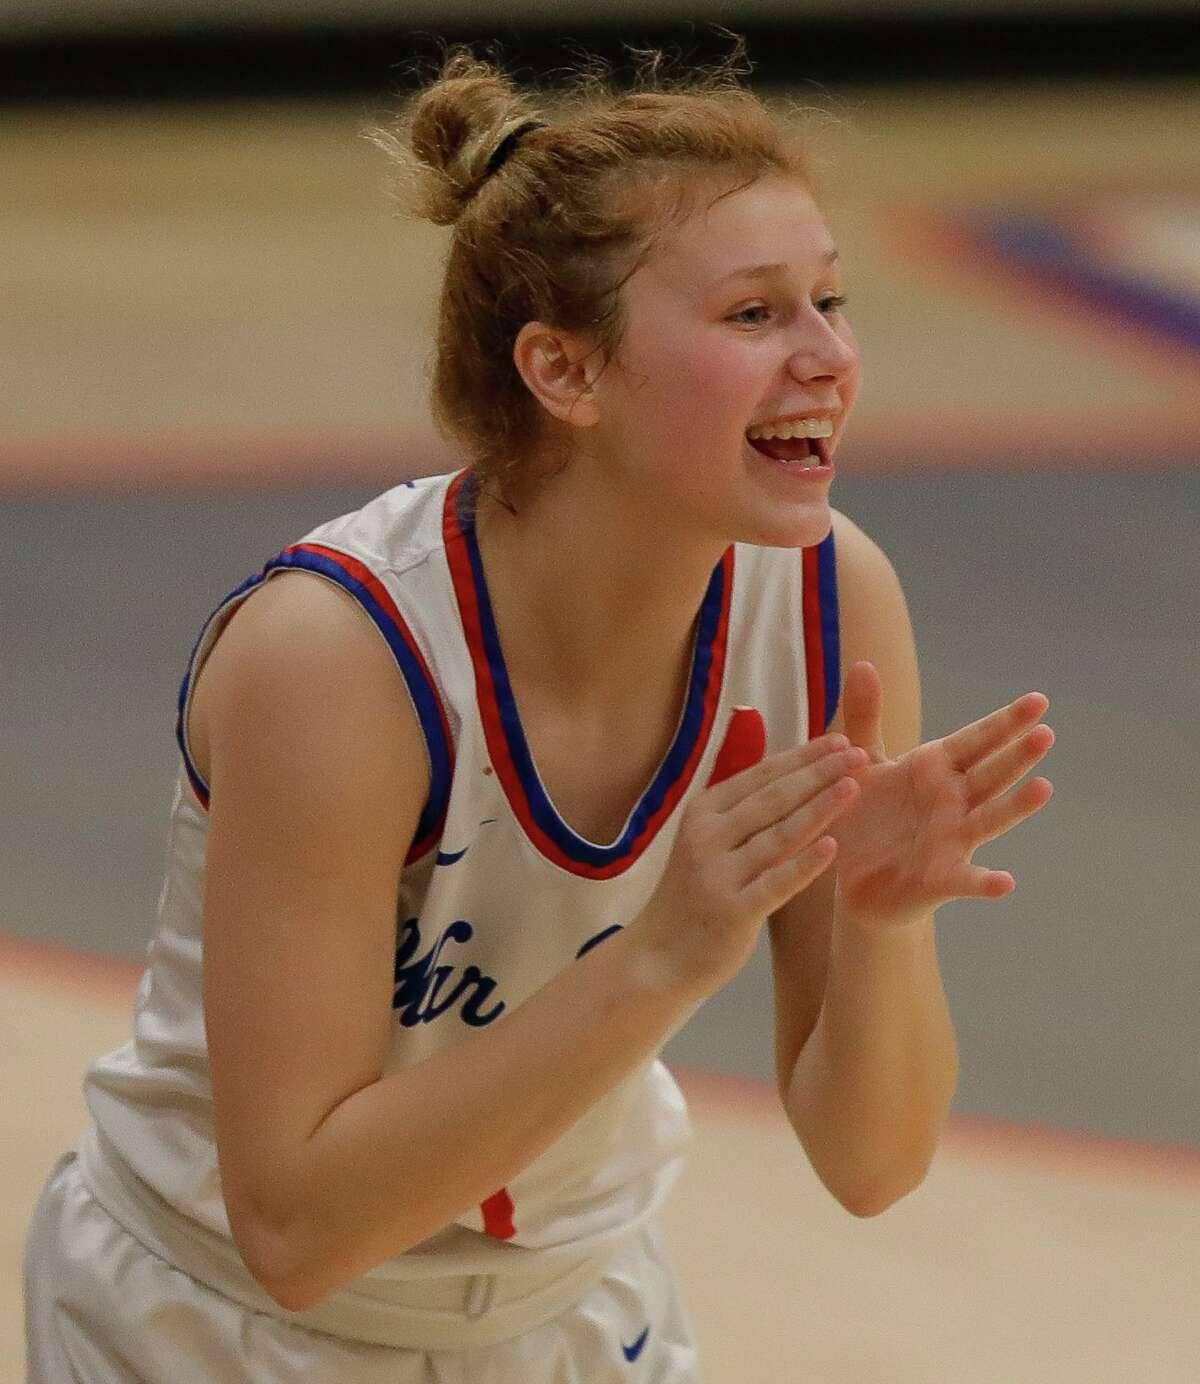 Oak Ridge senior Nikki Petrakovitz is the All-Montgomery County Offensive MVP.